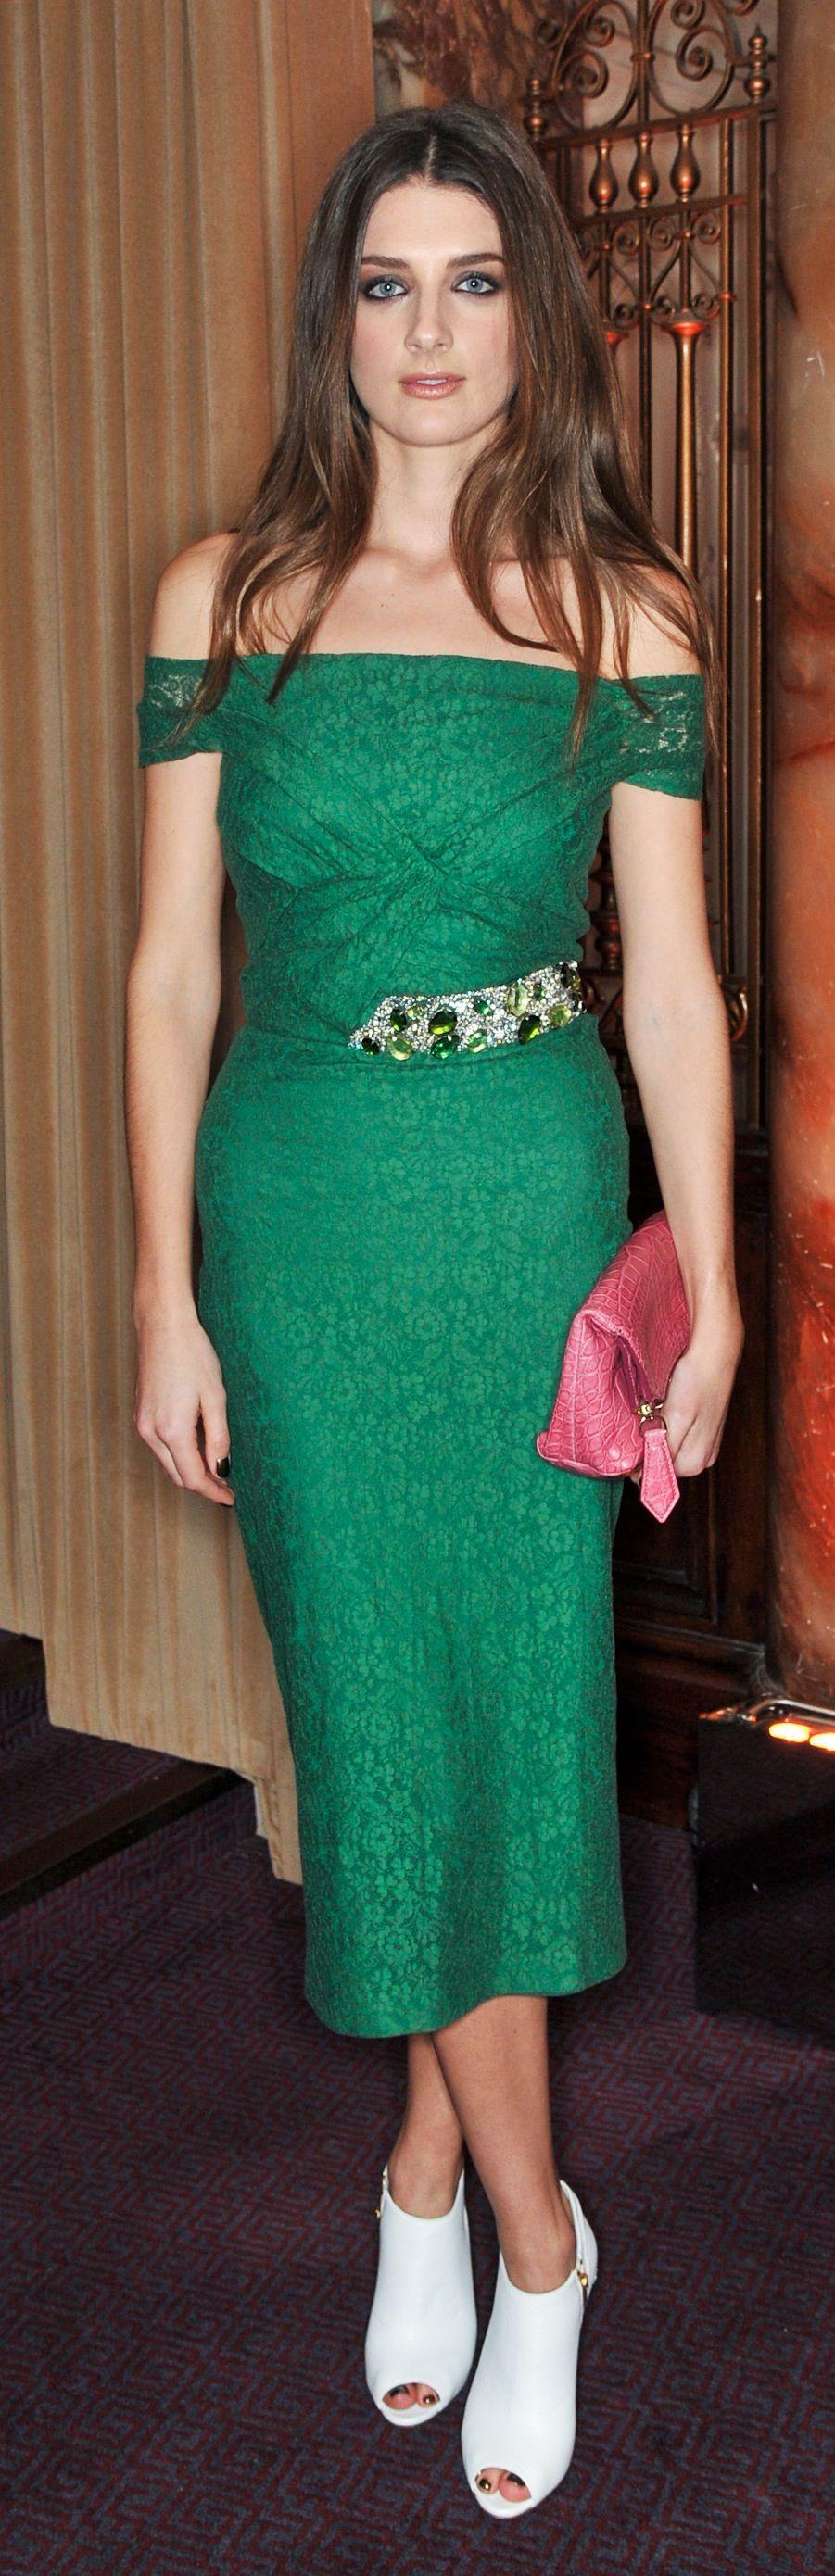 British actress Daisy Bevan wearing a Burberry Prorsum S/S14 Pre ...